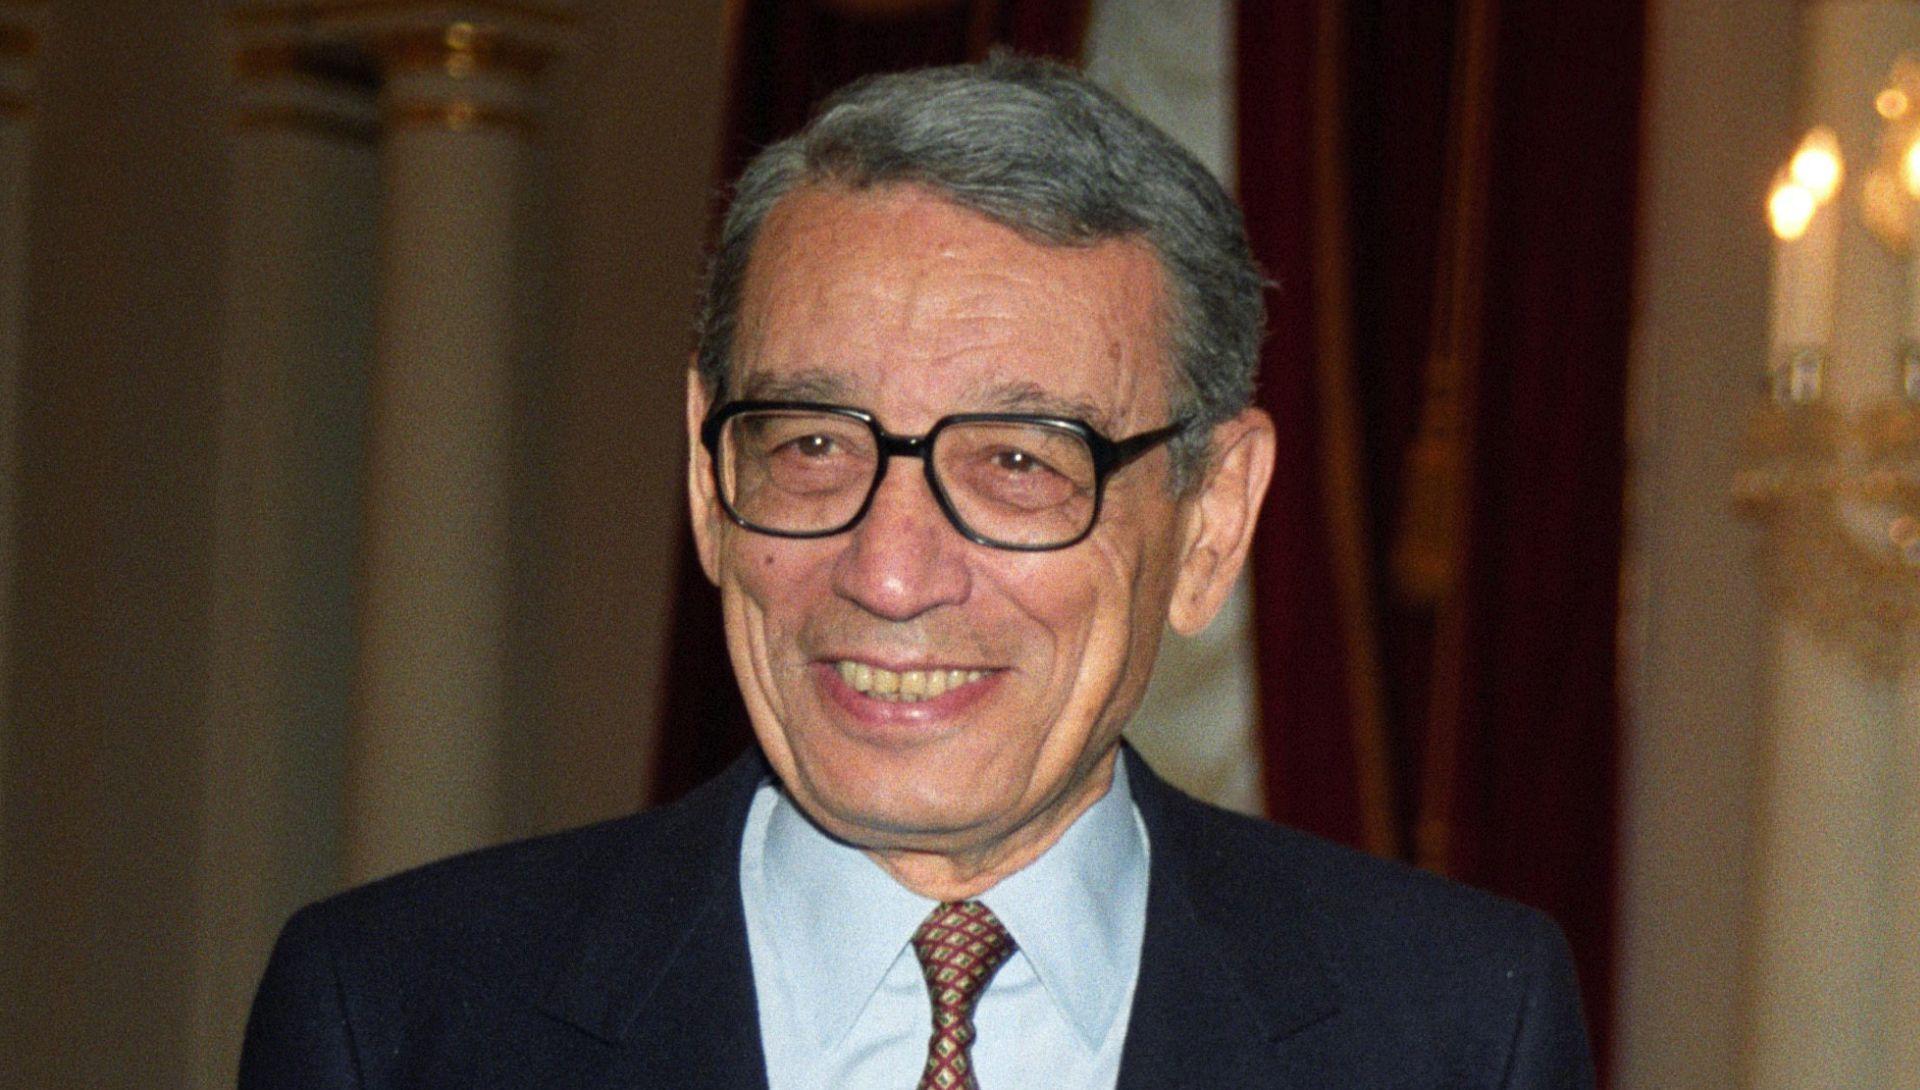 Umro bivši glavni tajnik UN-a Boutros Boutros-Ghali